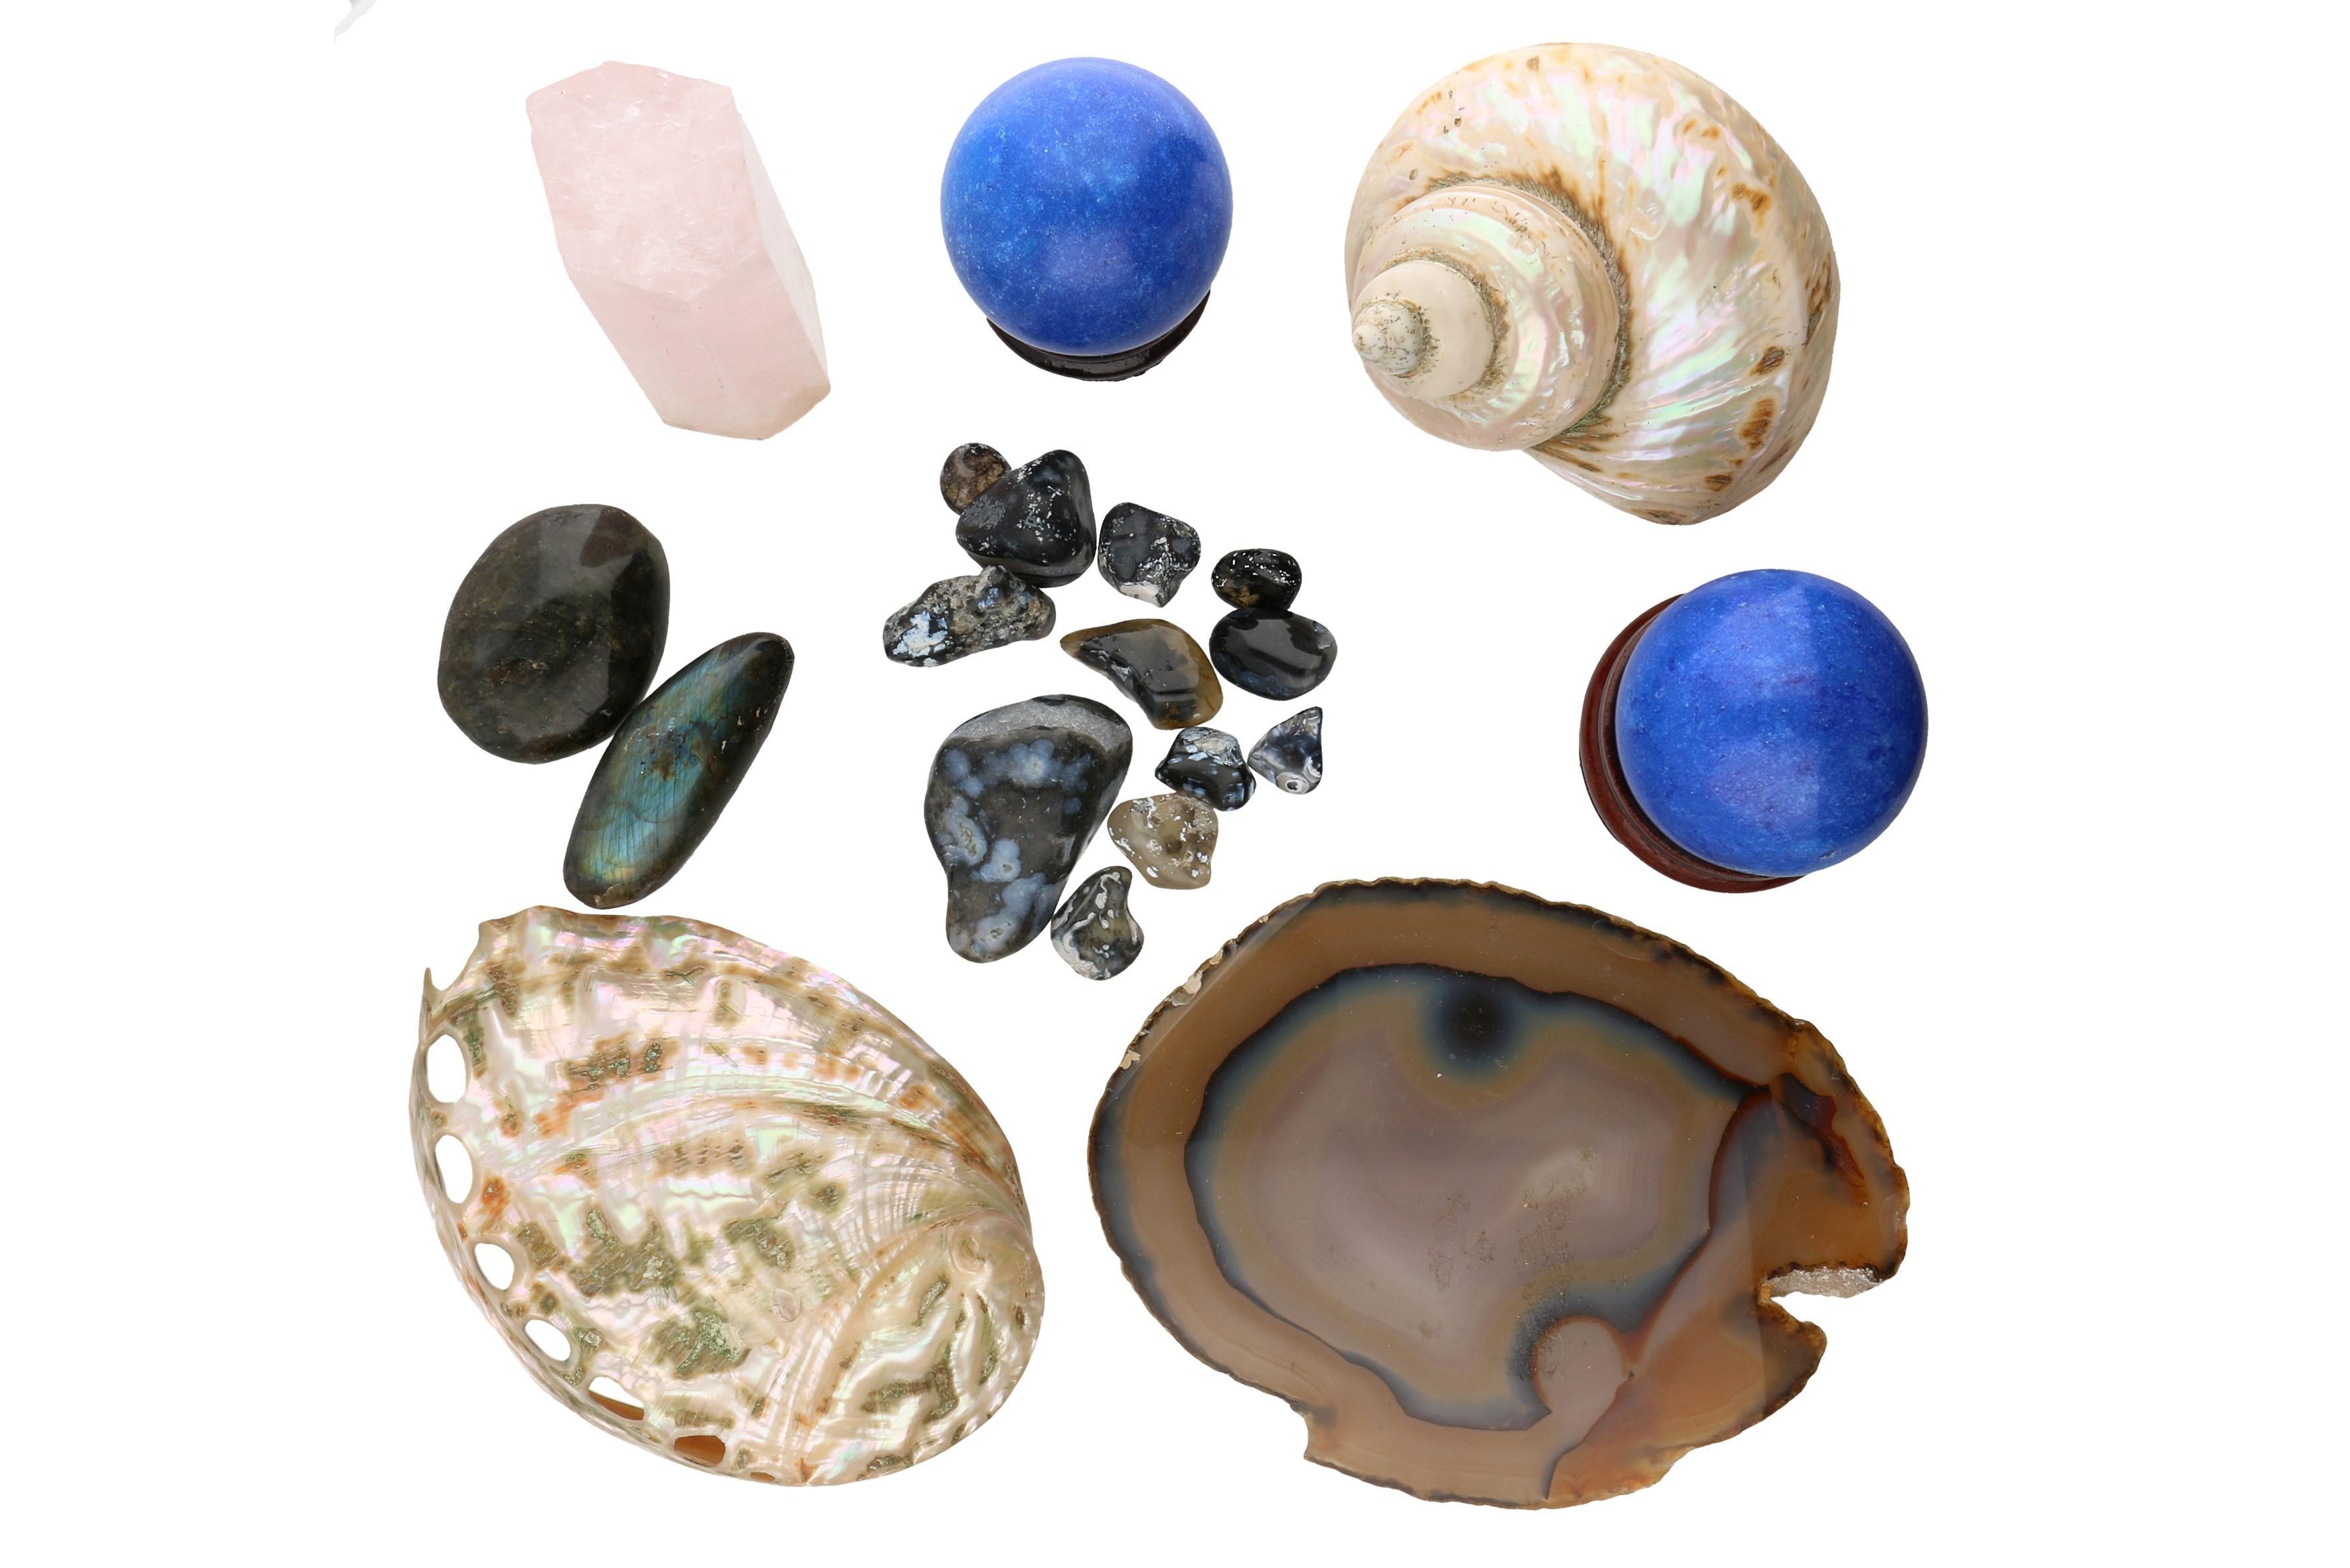 Polished Stones and Mollusk Shells